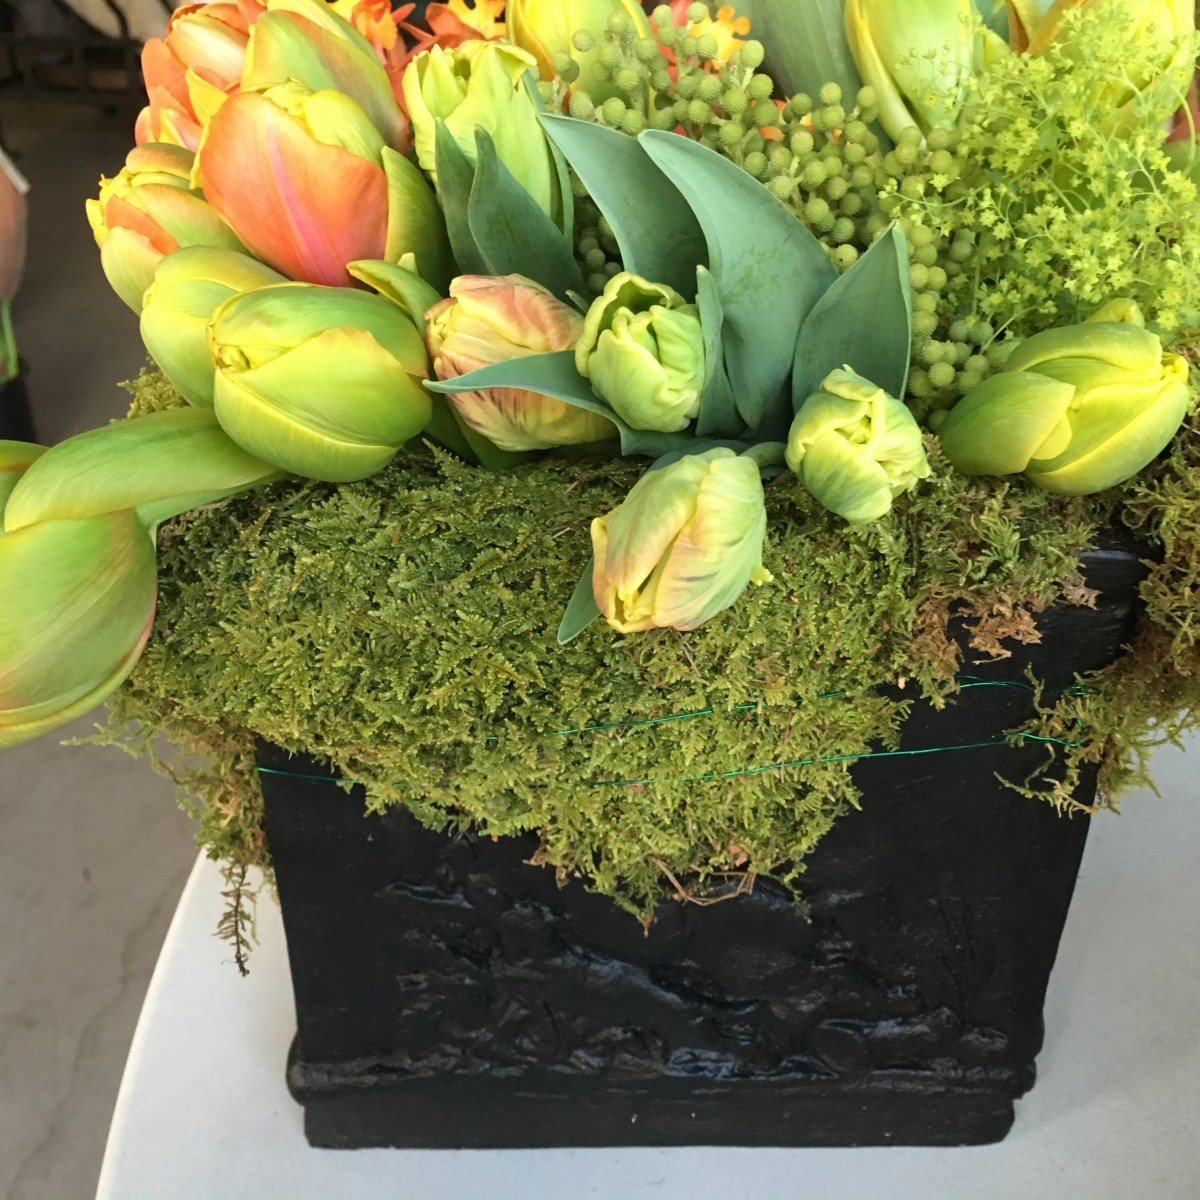 floral-cindye-spring-dinner-party-9